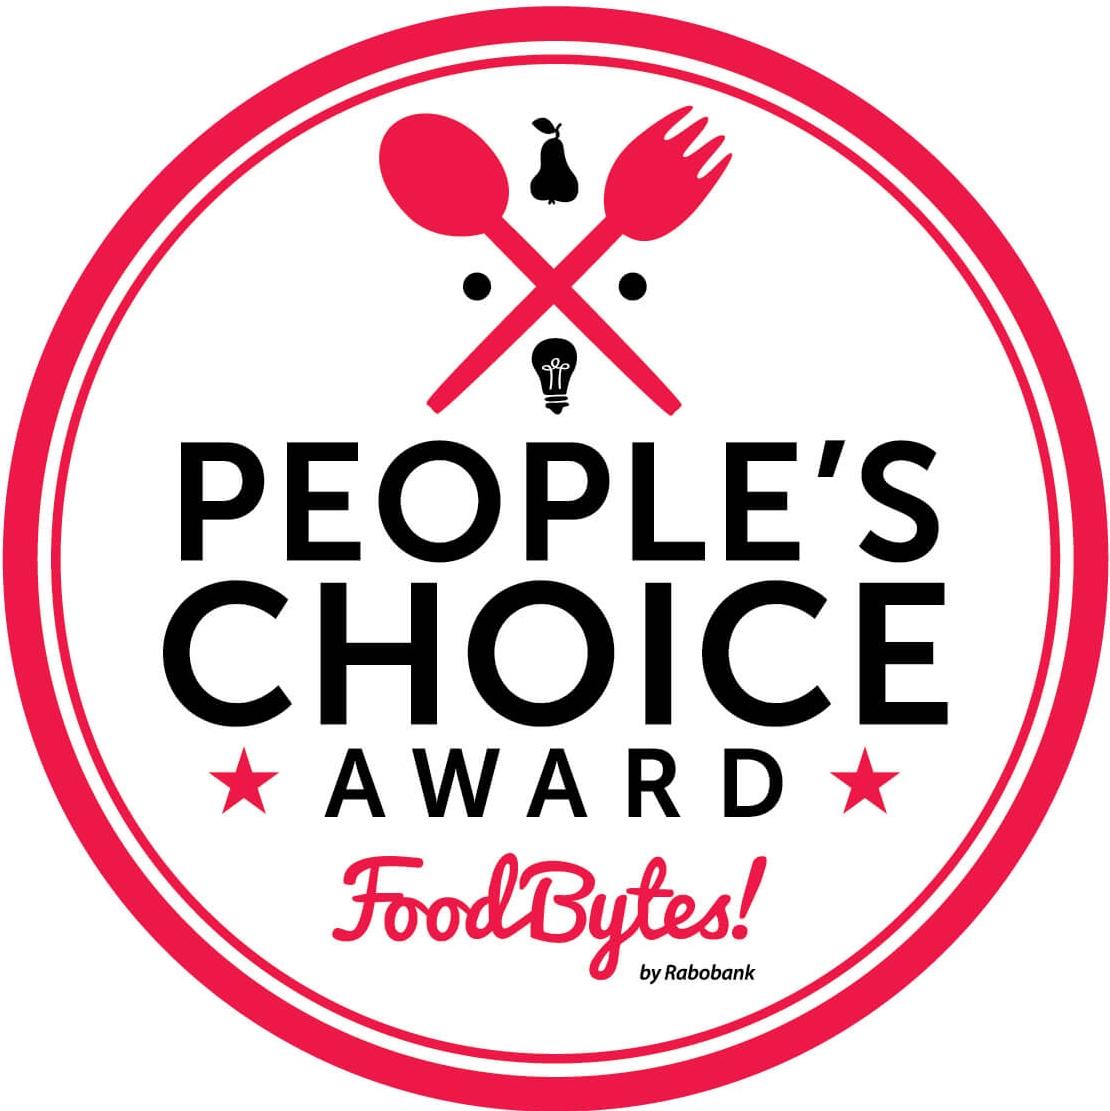 FoodBytes! People's Choice Award